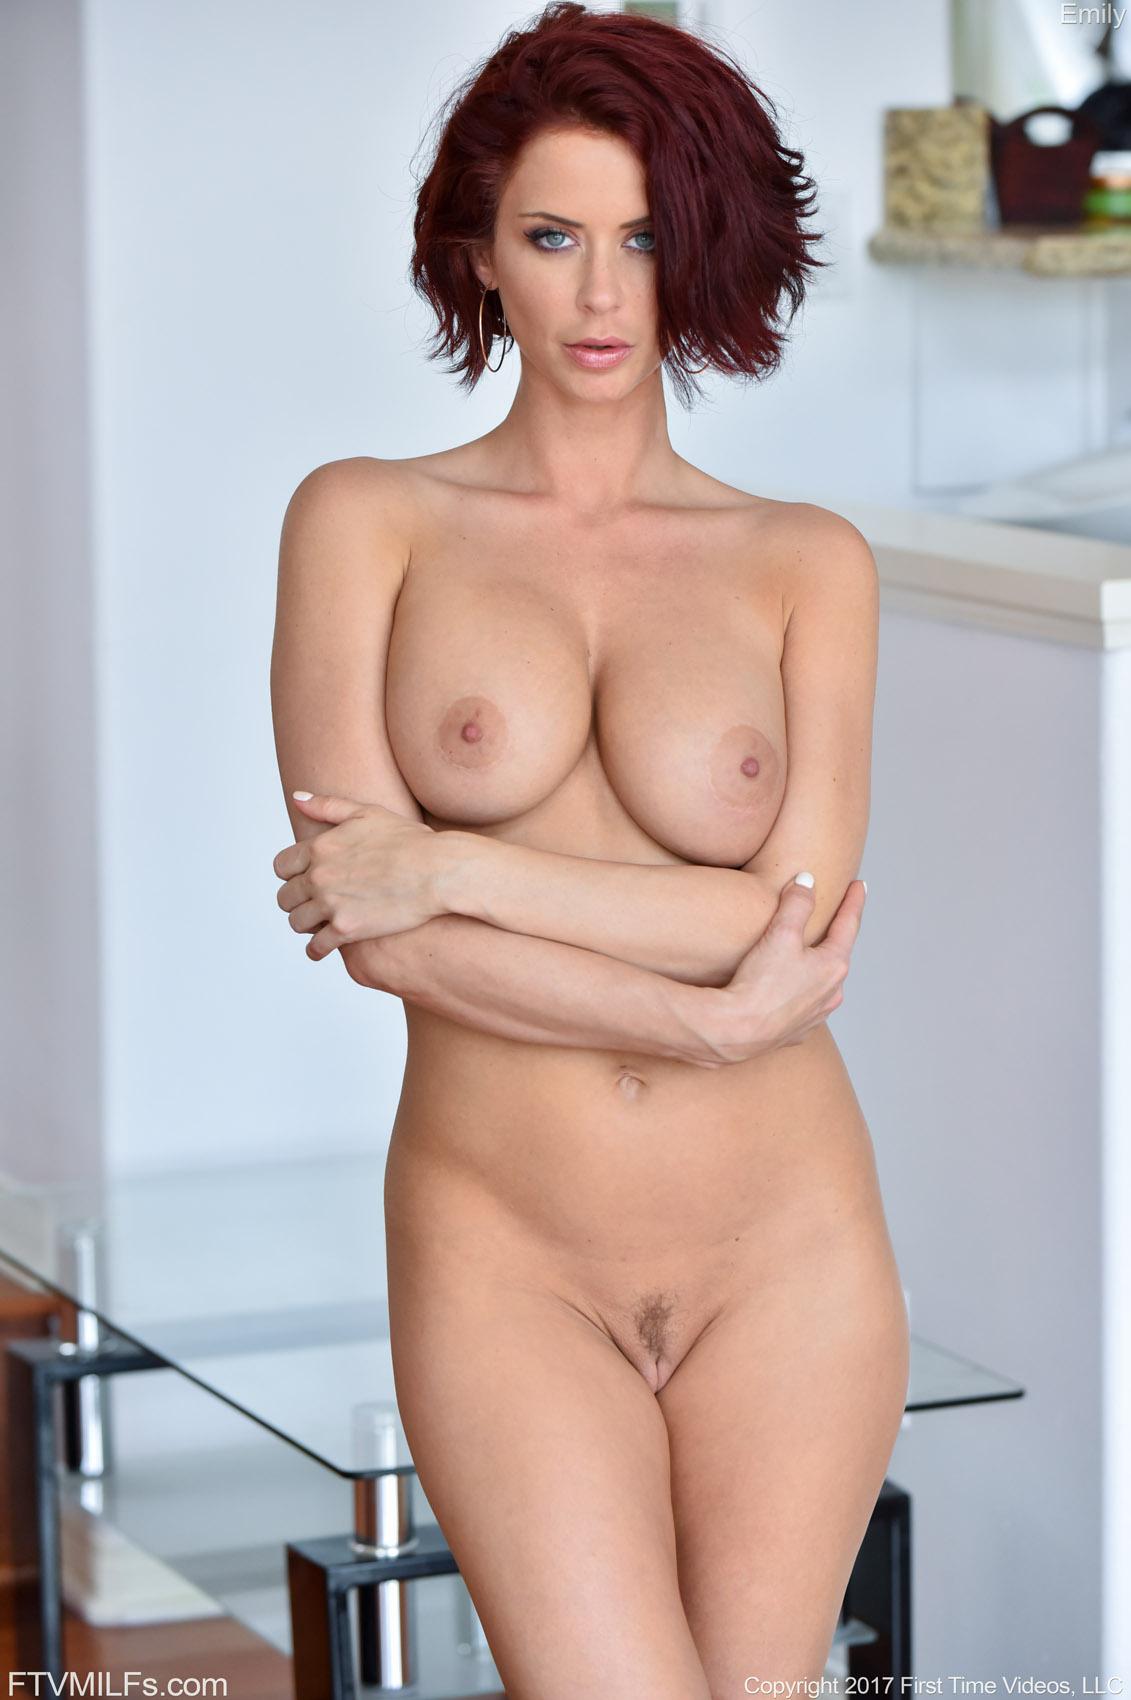 Emily addison lucy collett porn